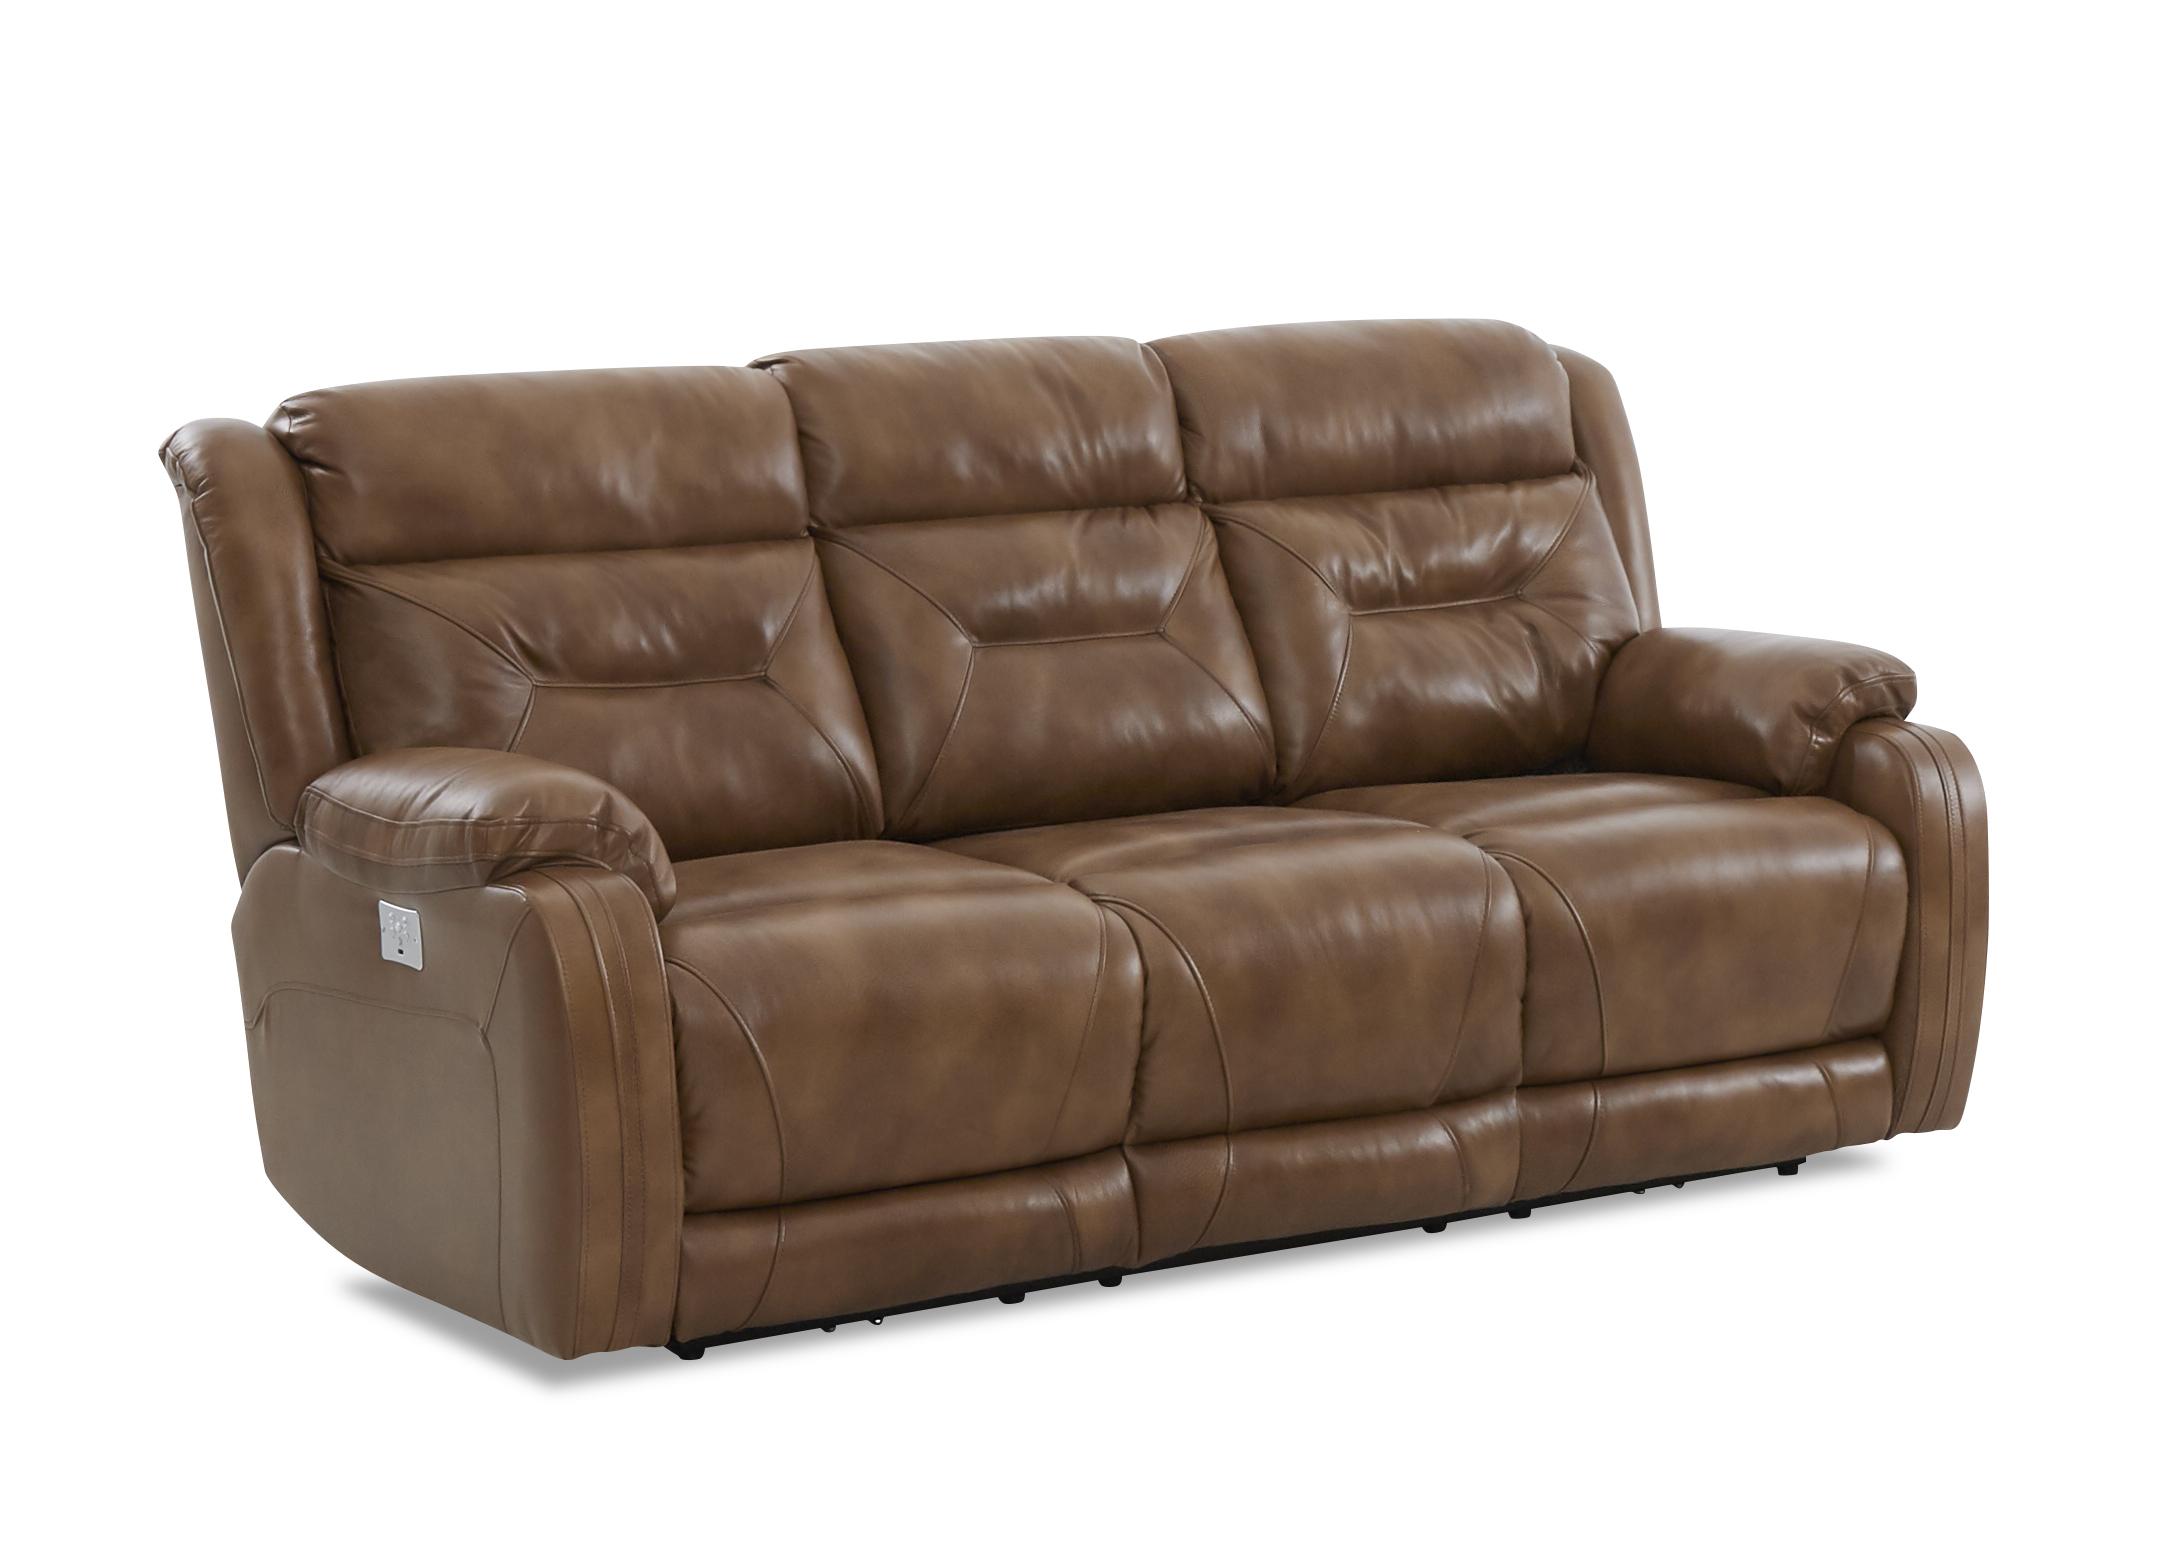 Tony Leather Power Reclining Sofa w/ Power | Sofas and ...